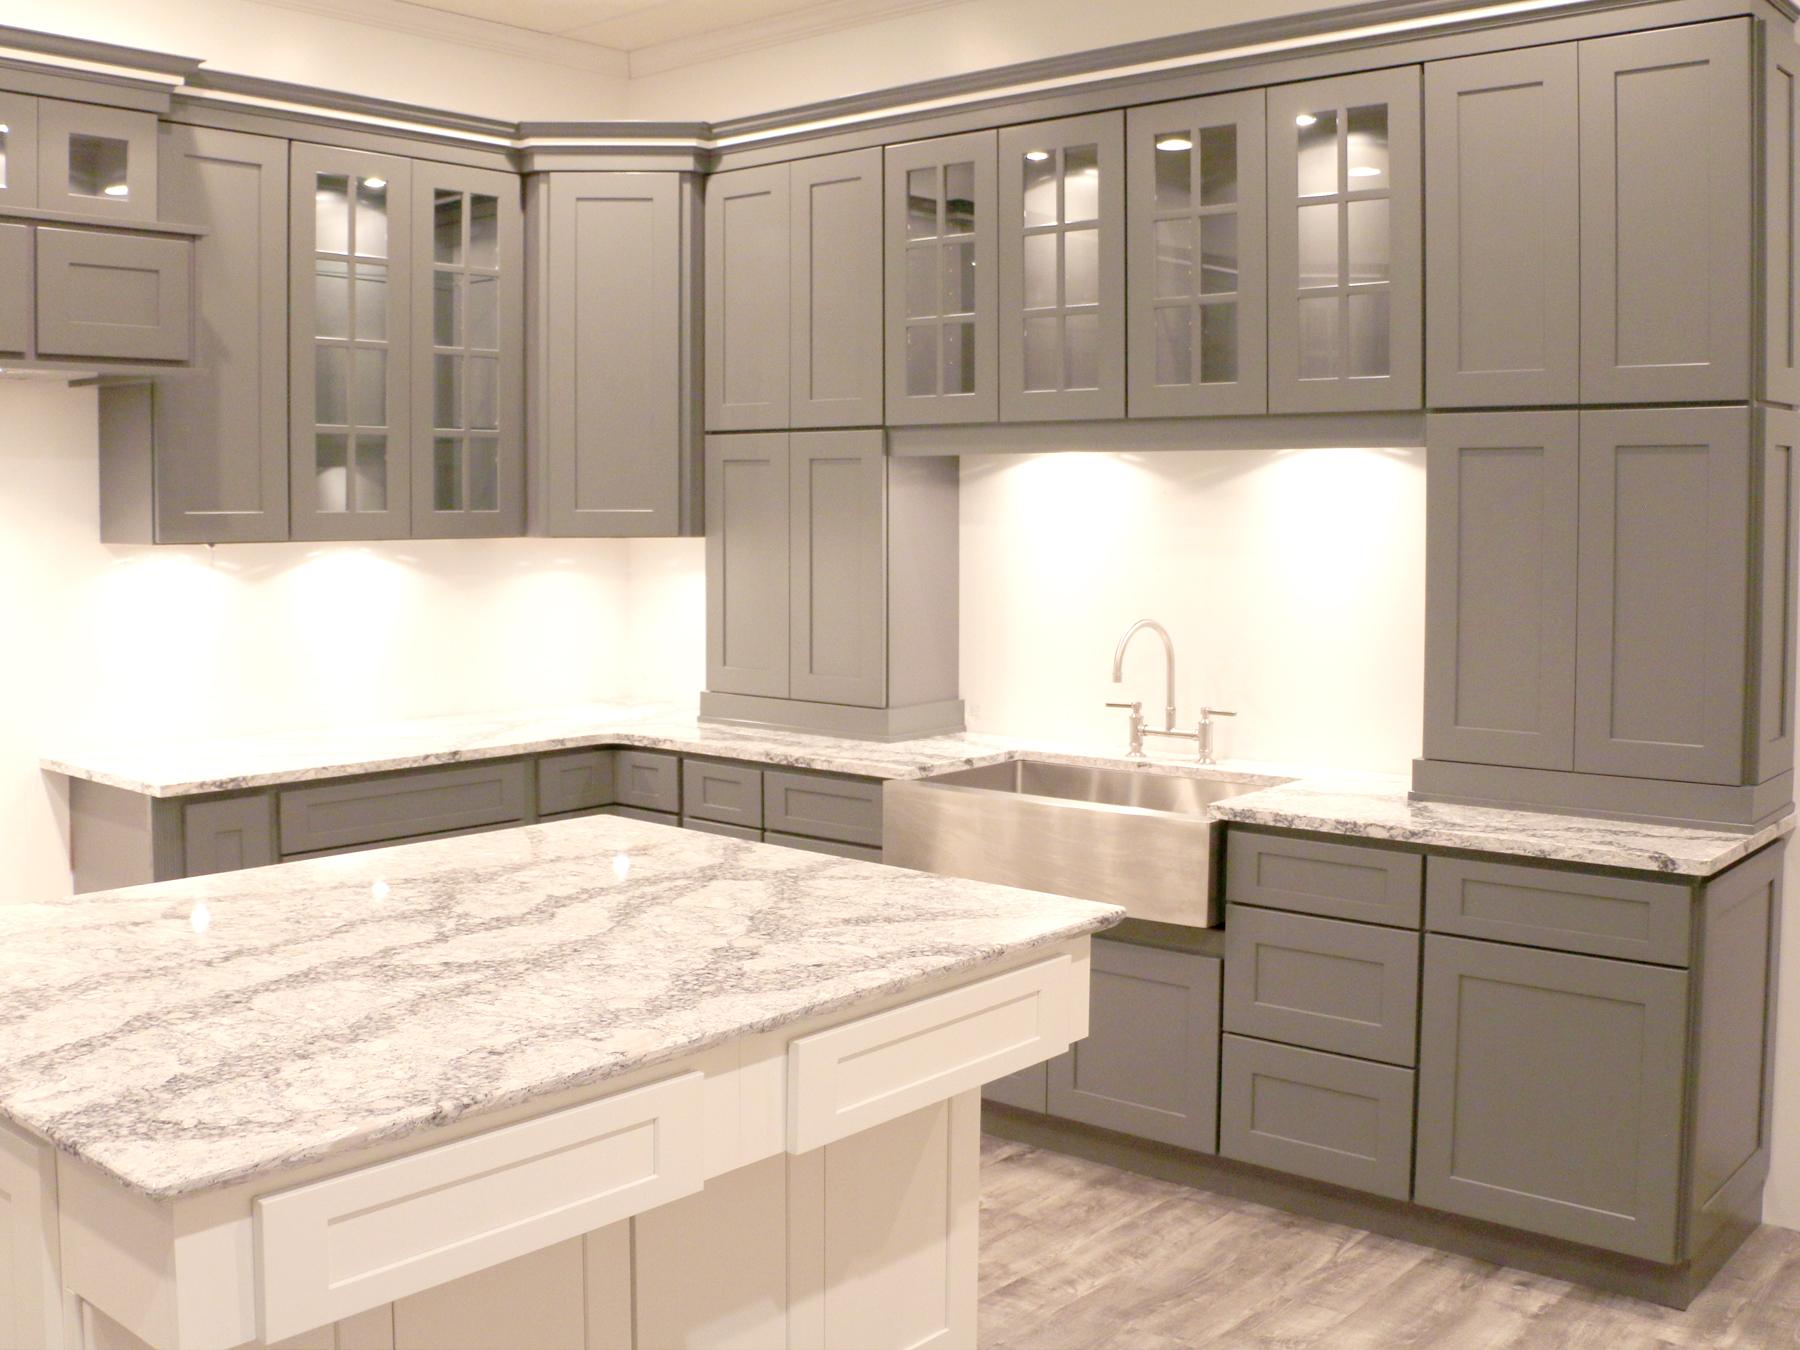 Summit Platinum Shaker RTA Kitchen Cabinets